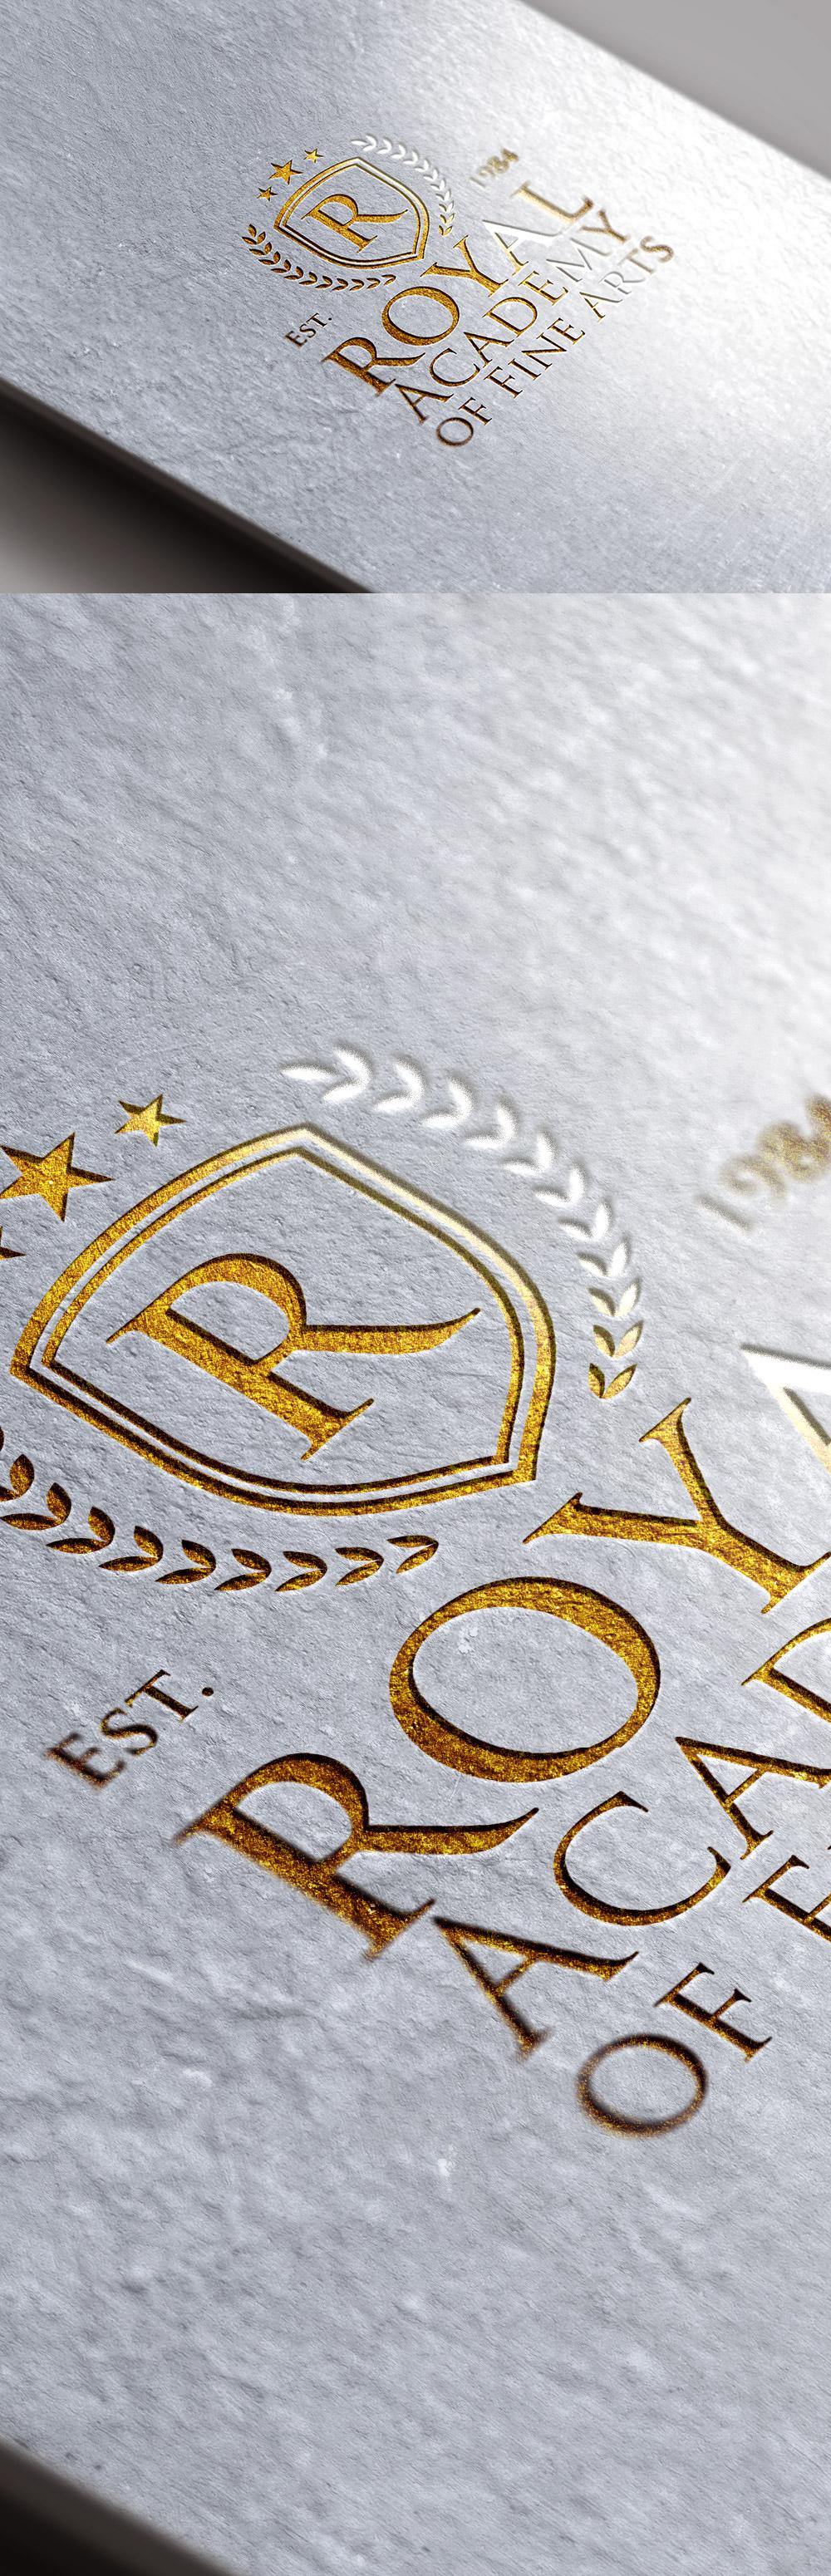 free gold foil logo mockup psd 90 mb graphics fuel free photoshop